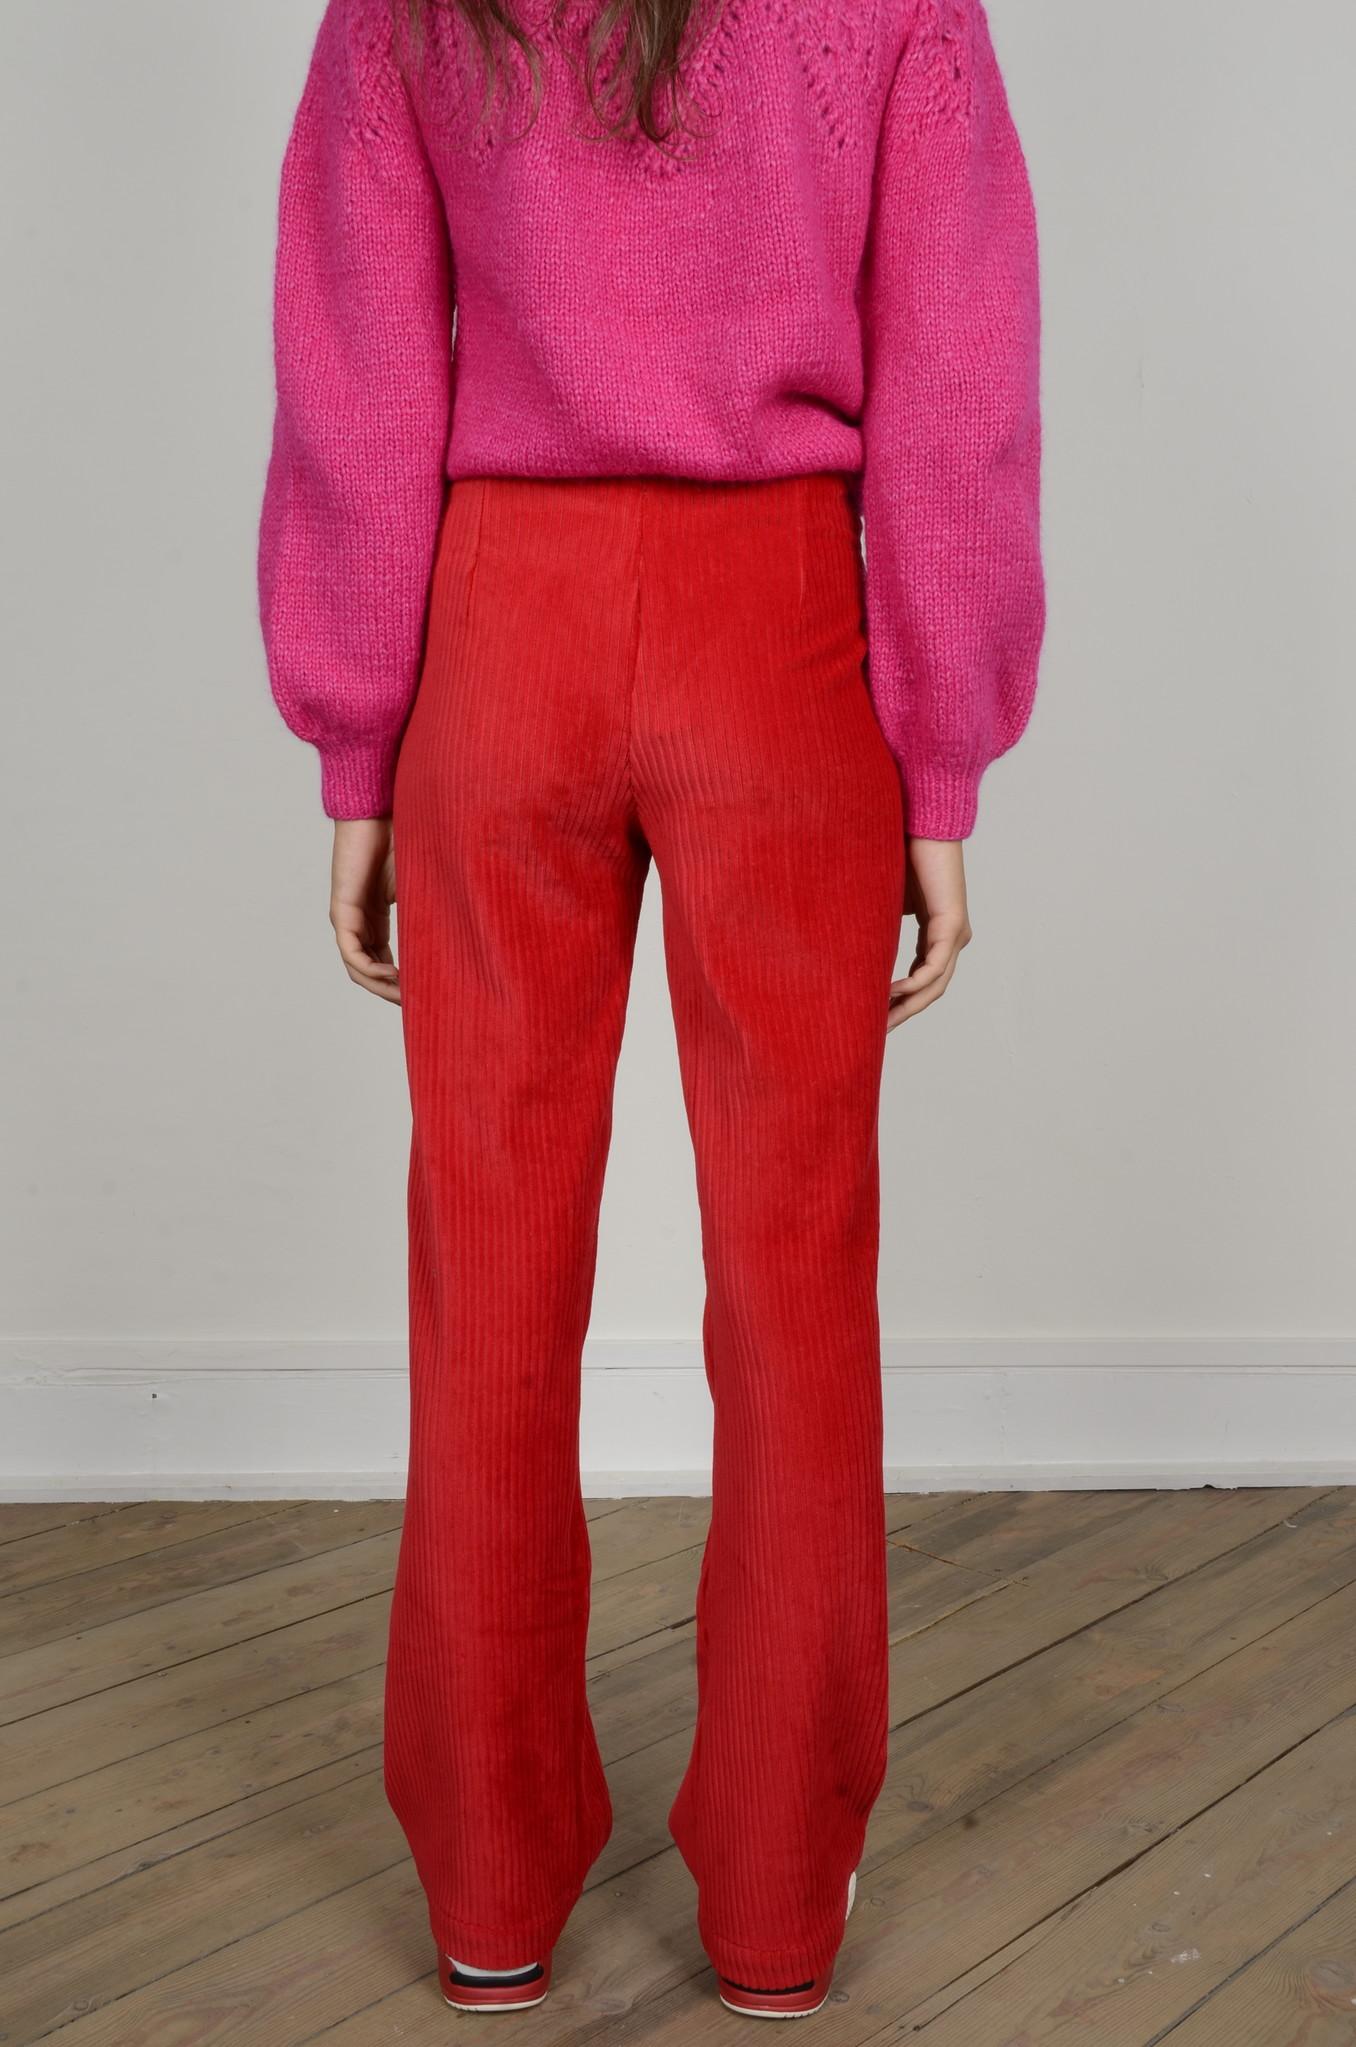 MARINE PANTS RED-3